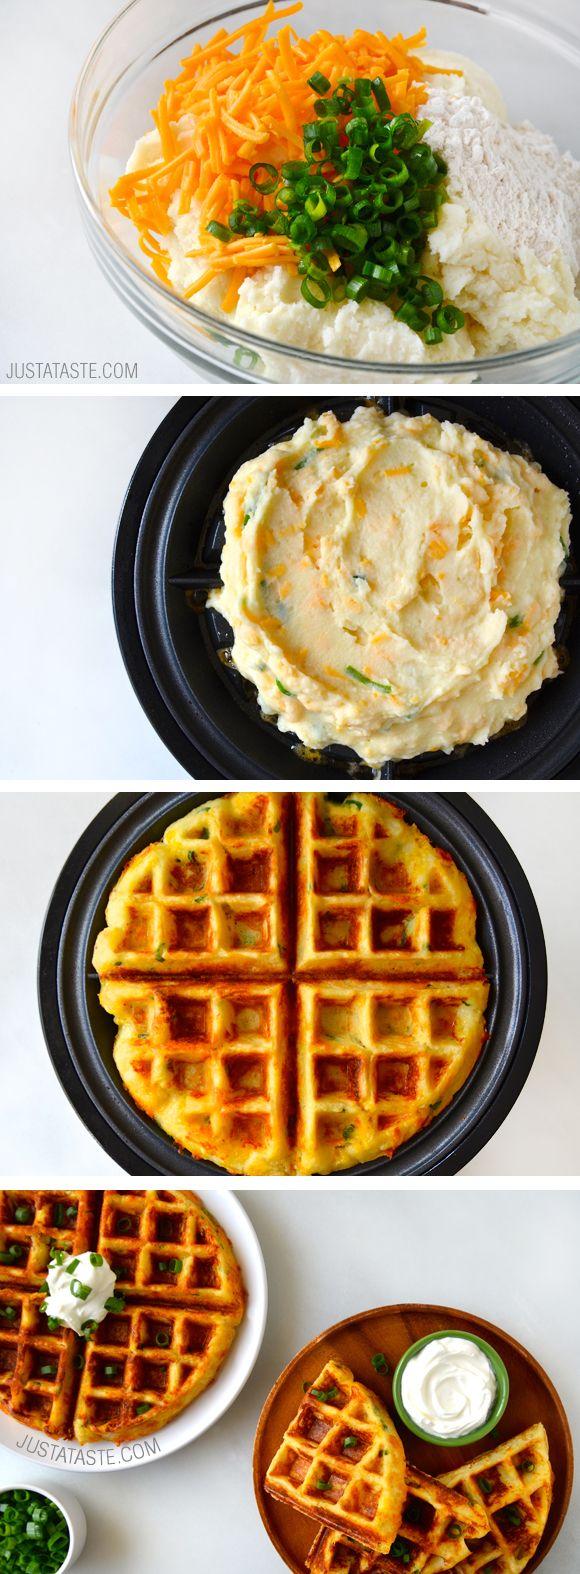 Cheesy Leftover Mashed Potato Waffles Recipe From Justataste Com Waffles Waffle Maker